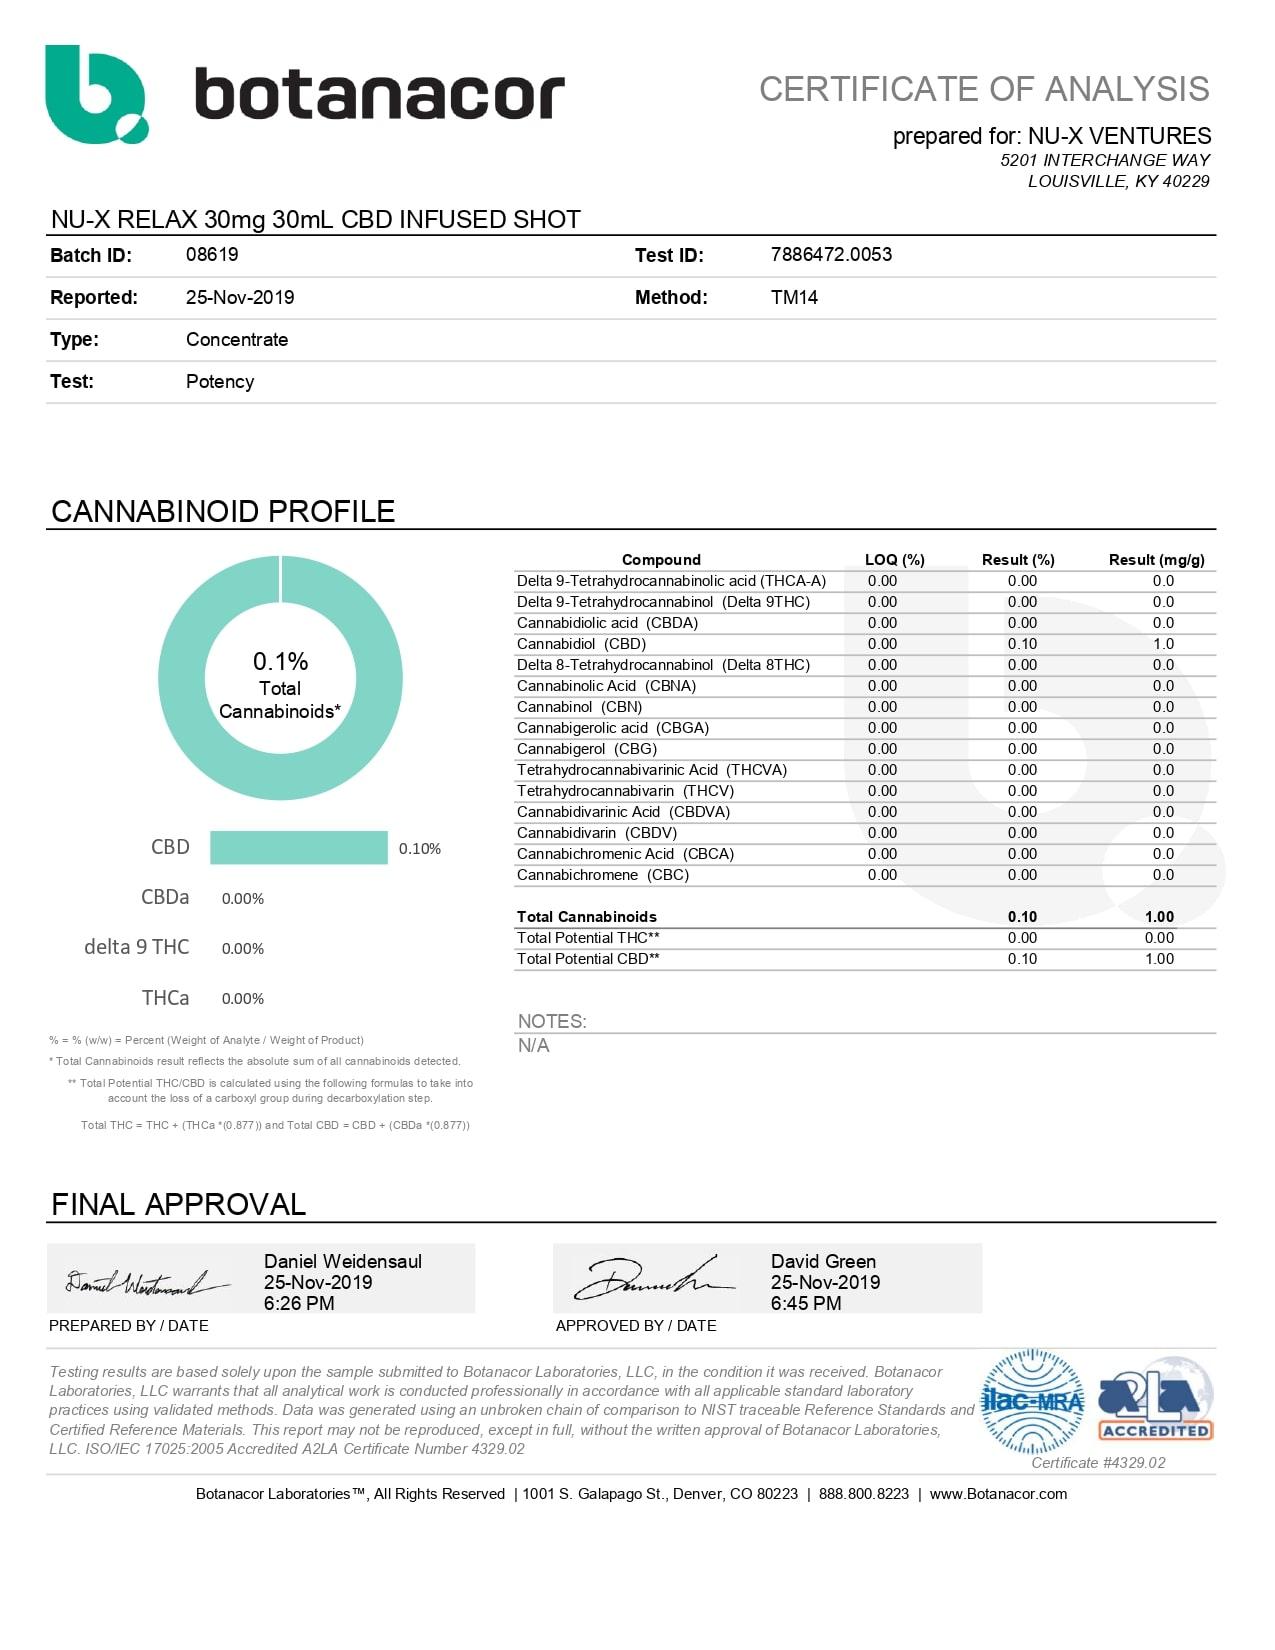 NU-X CBD Shot Lab Report Blueberry Relax 30mg